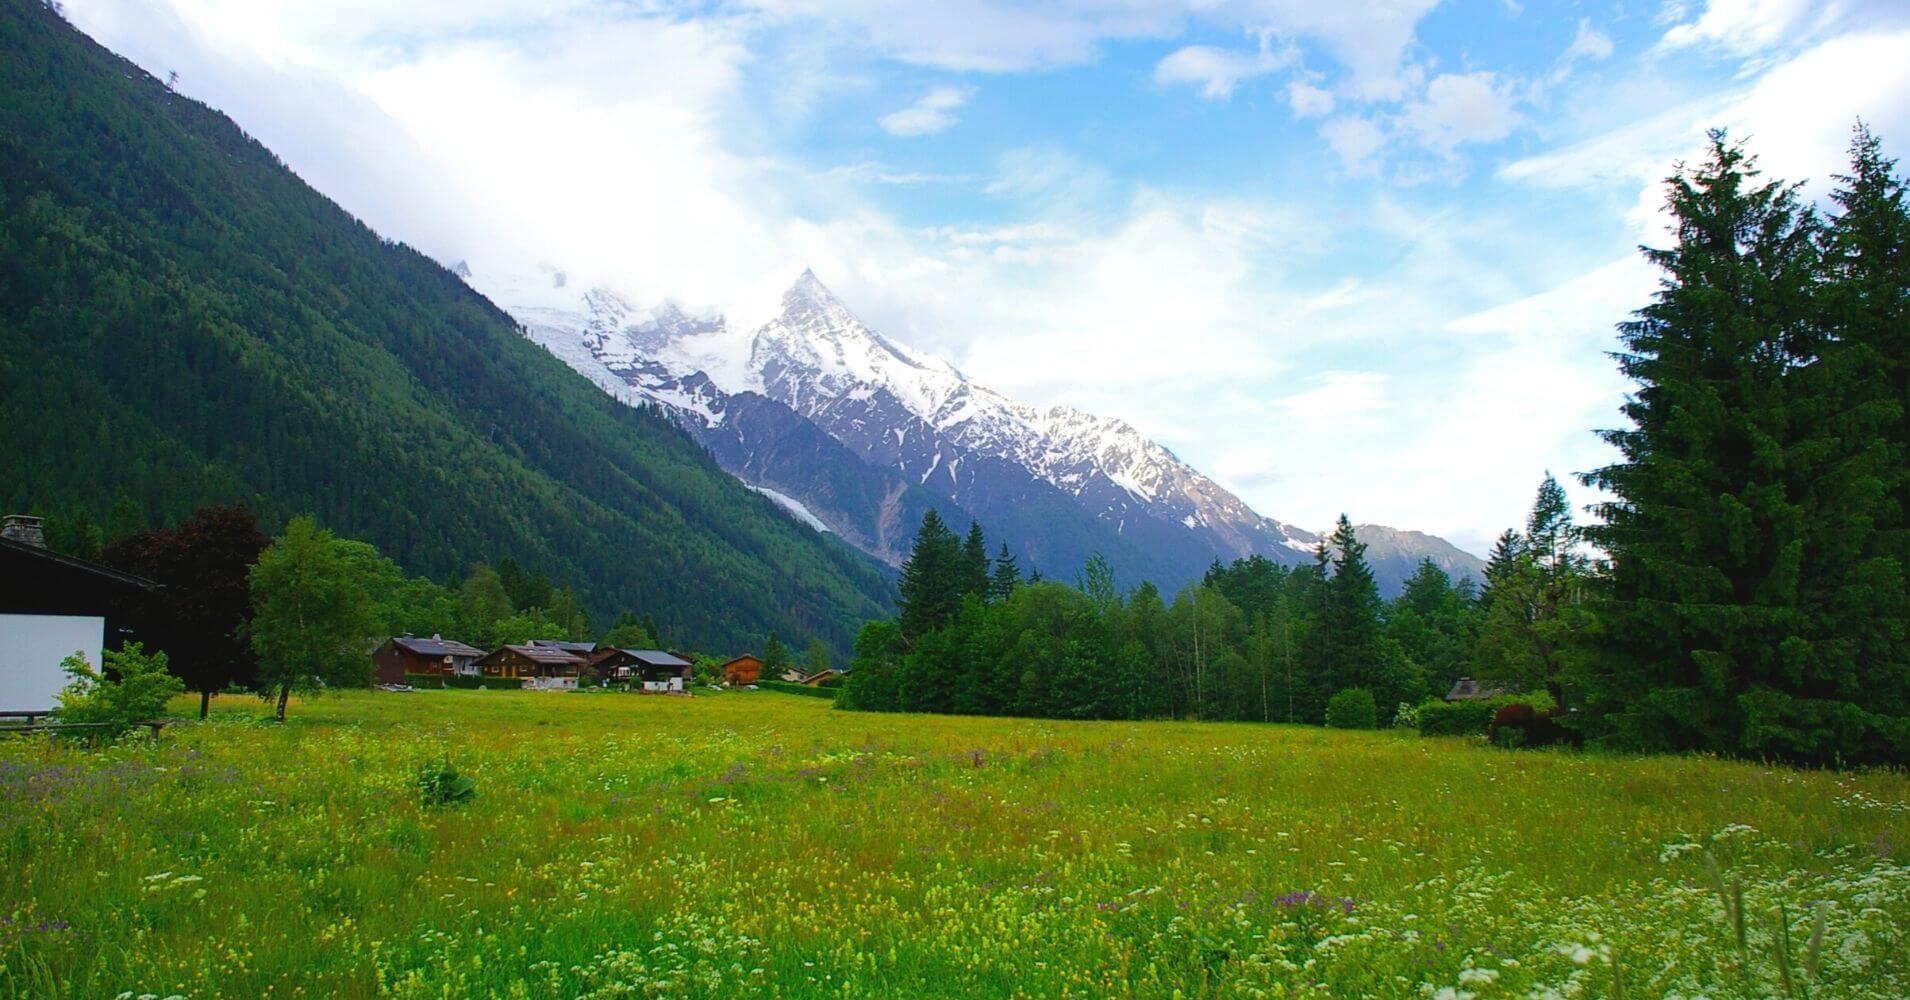 Tour del Mont Blanc. Suiza, Francia, Italia. Cordillera de los Alpes.